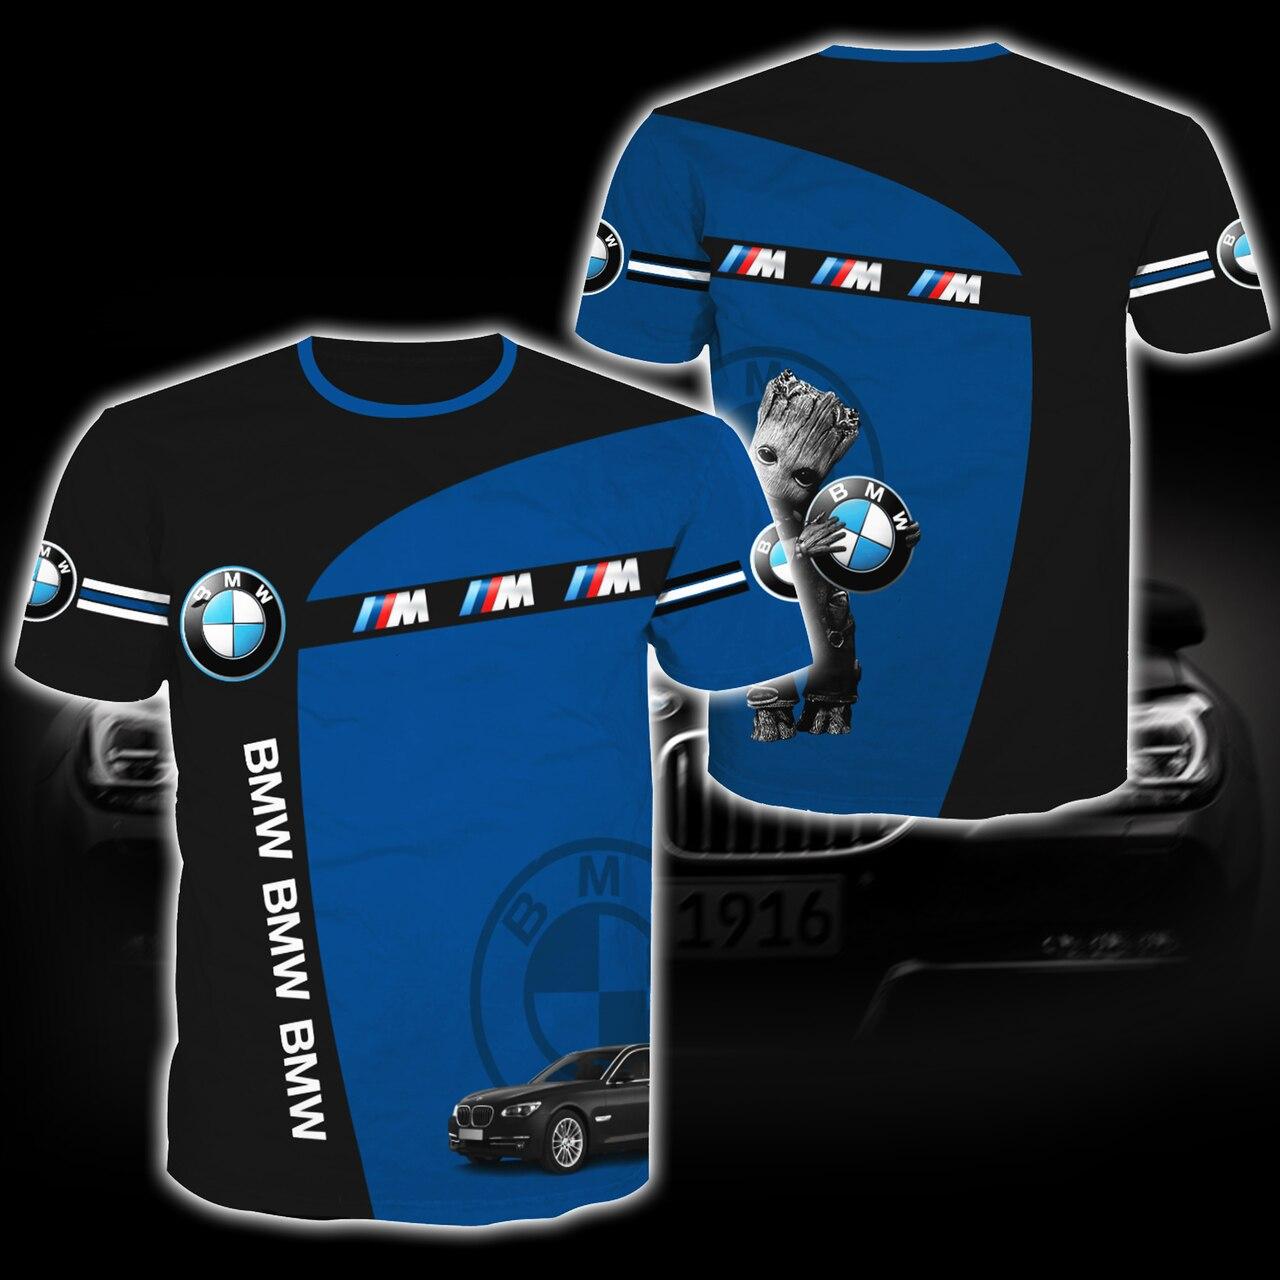 Baby groot hold bmw logo full printing tshirt